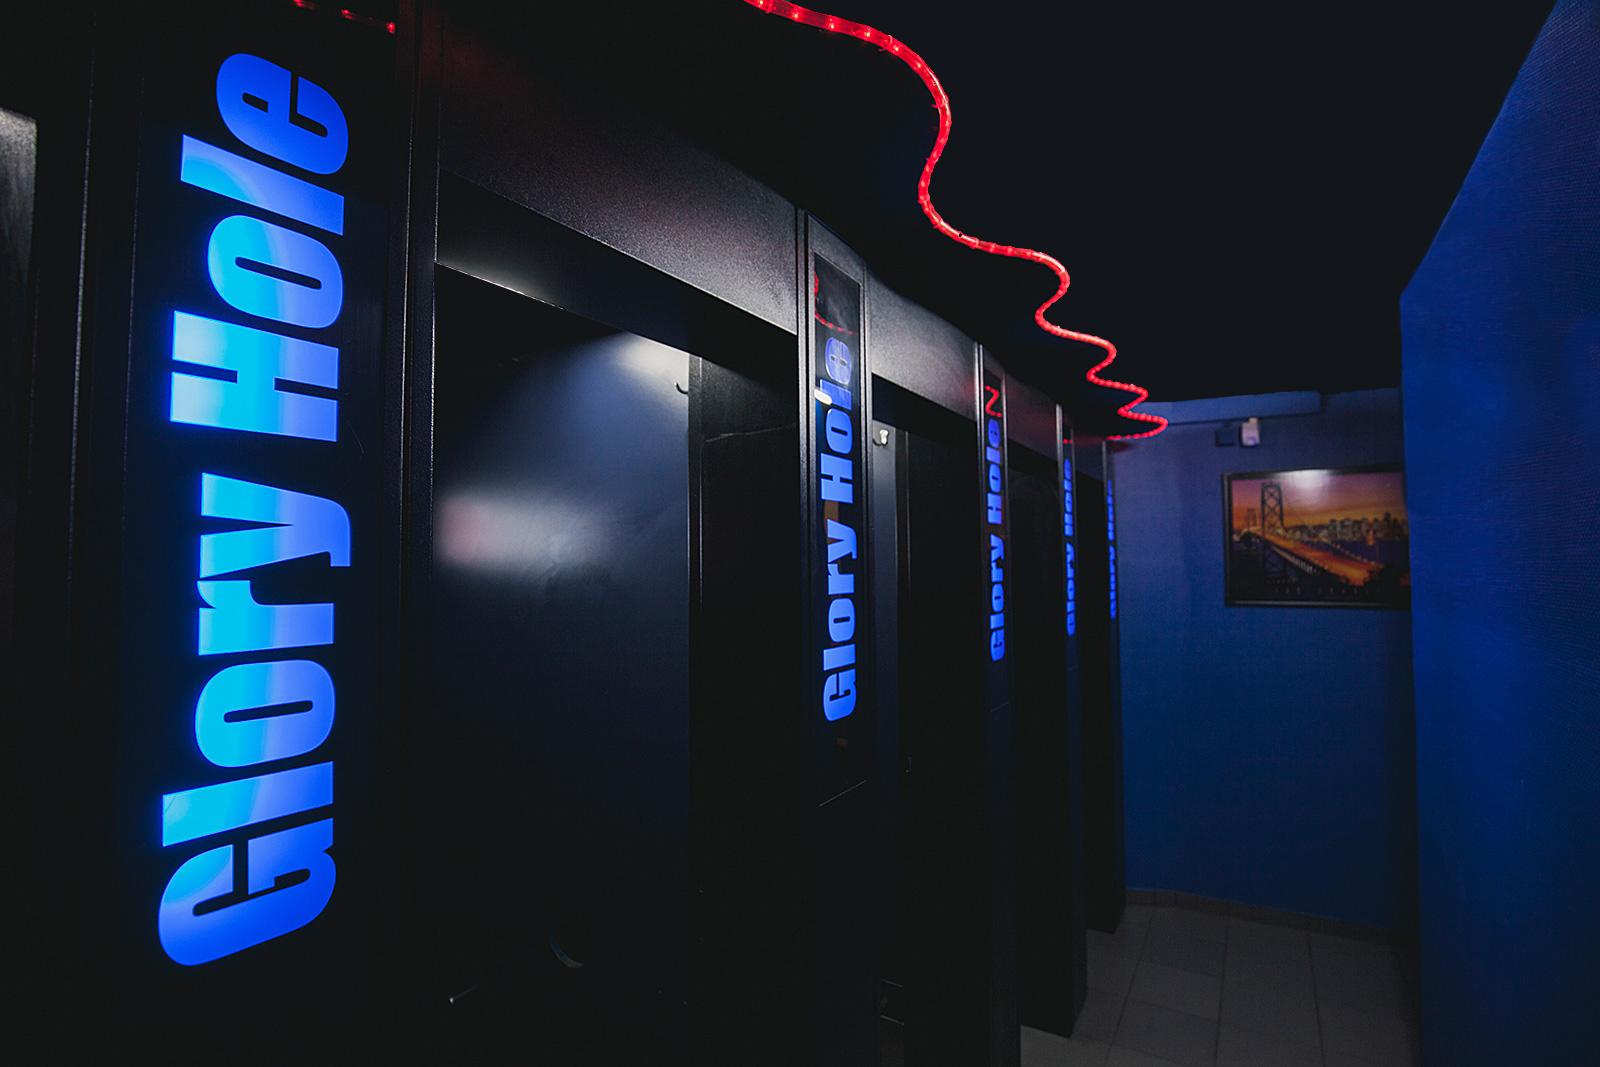 josefines sexkino kino hole